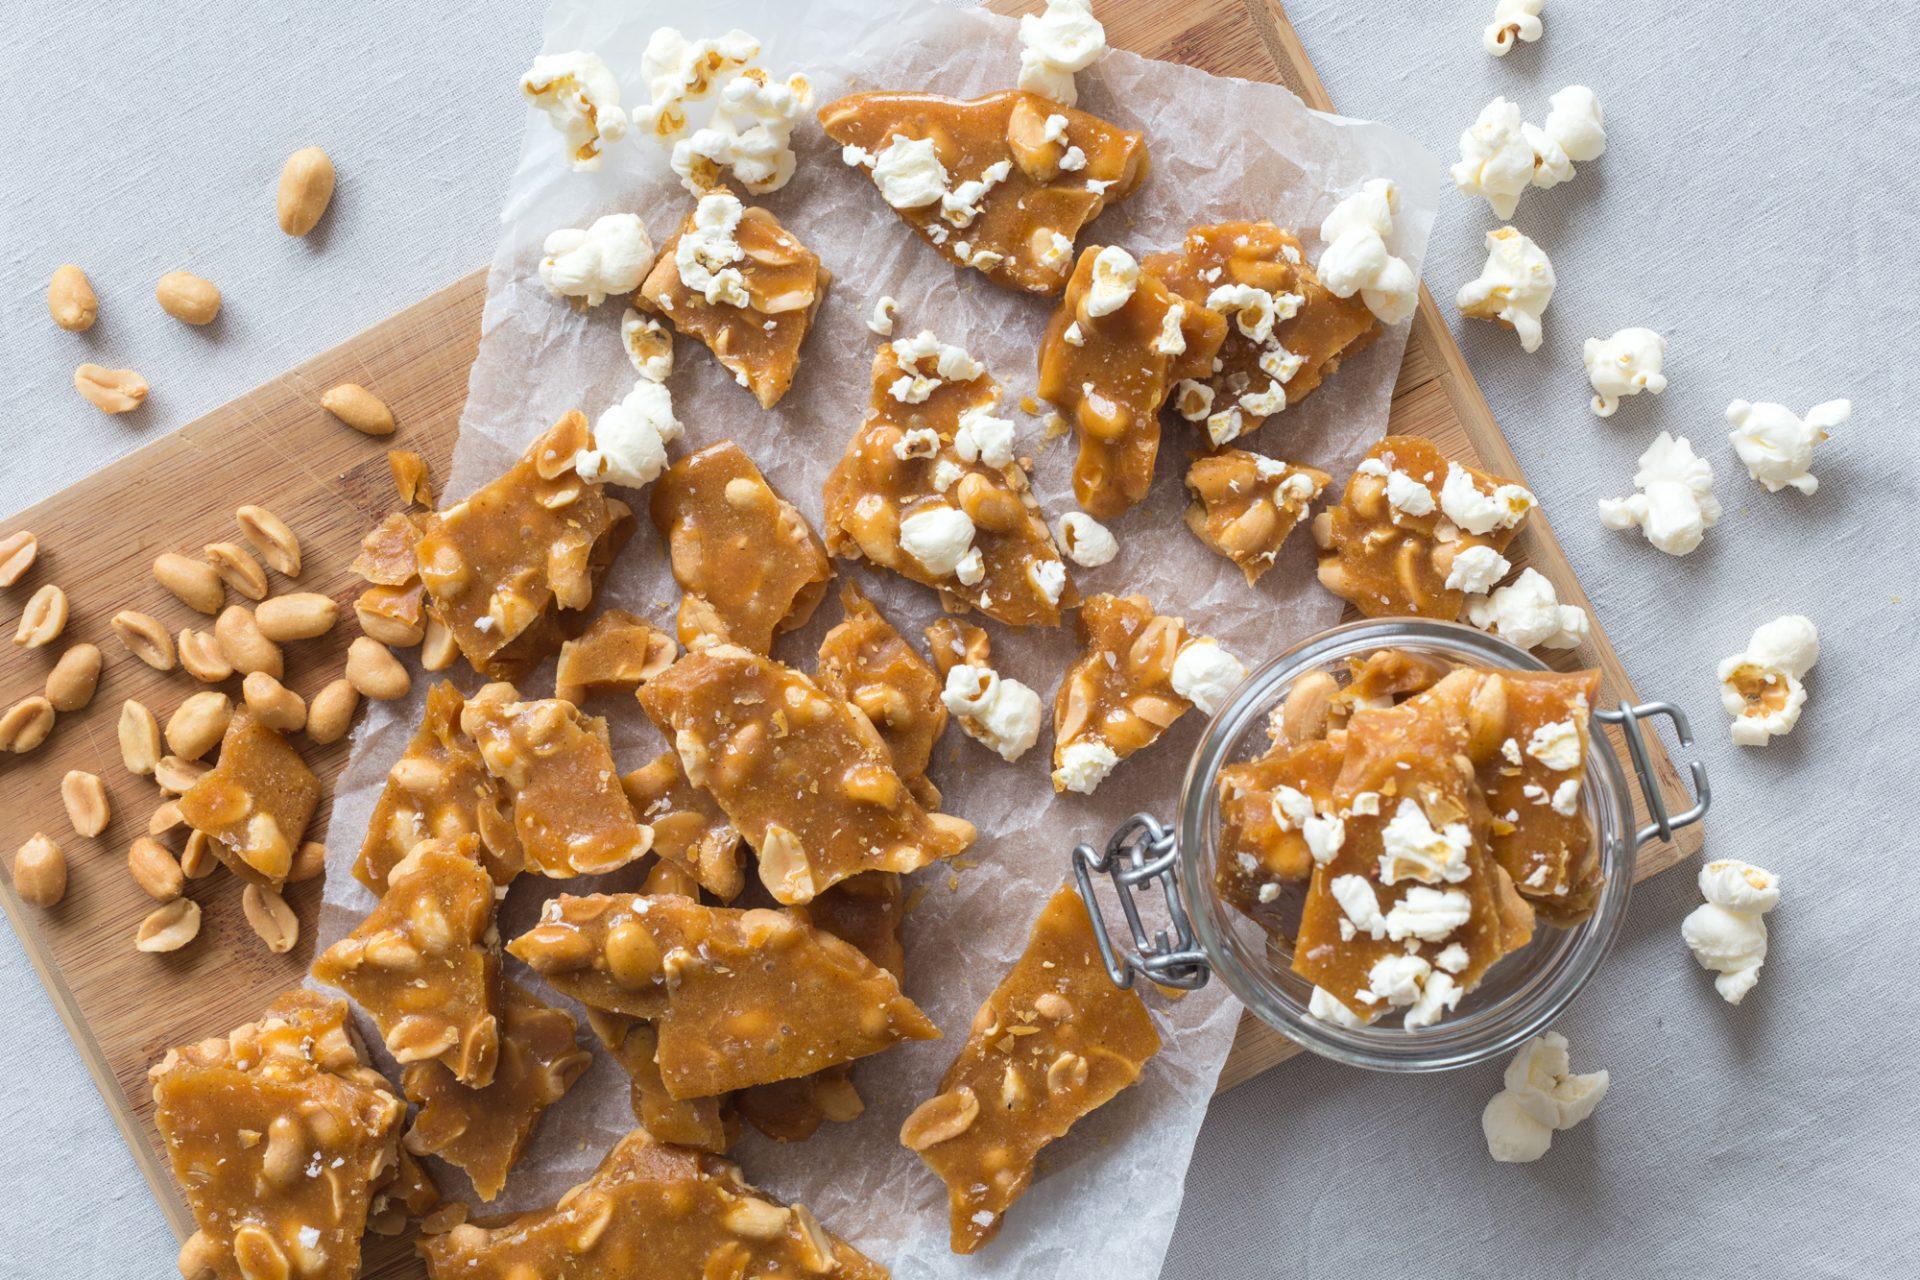 popcorn-peanut-brittle-dnilva-1-1920x1280